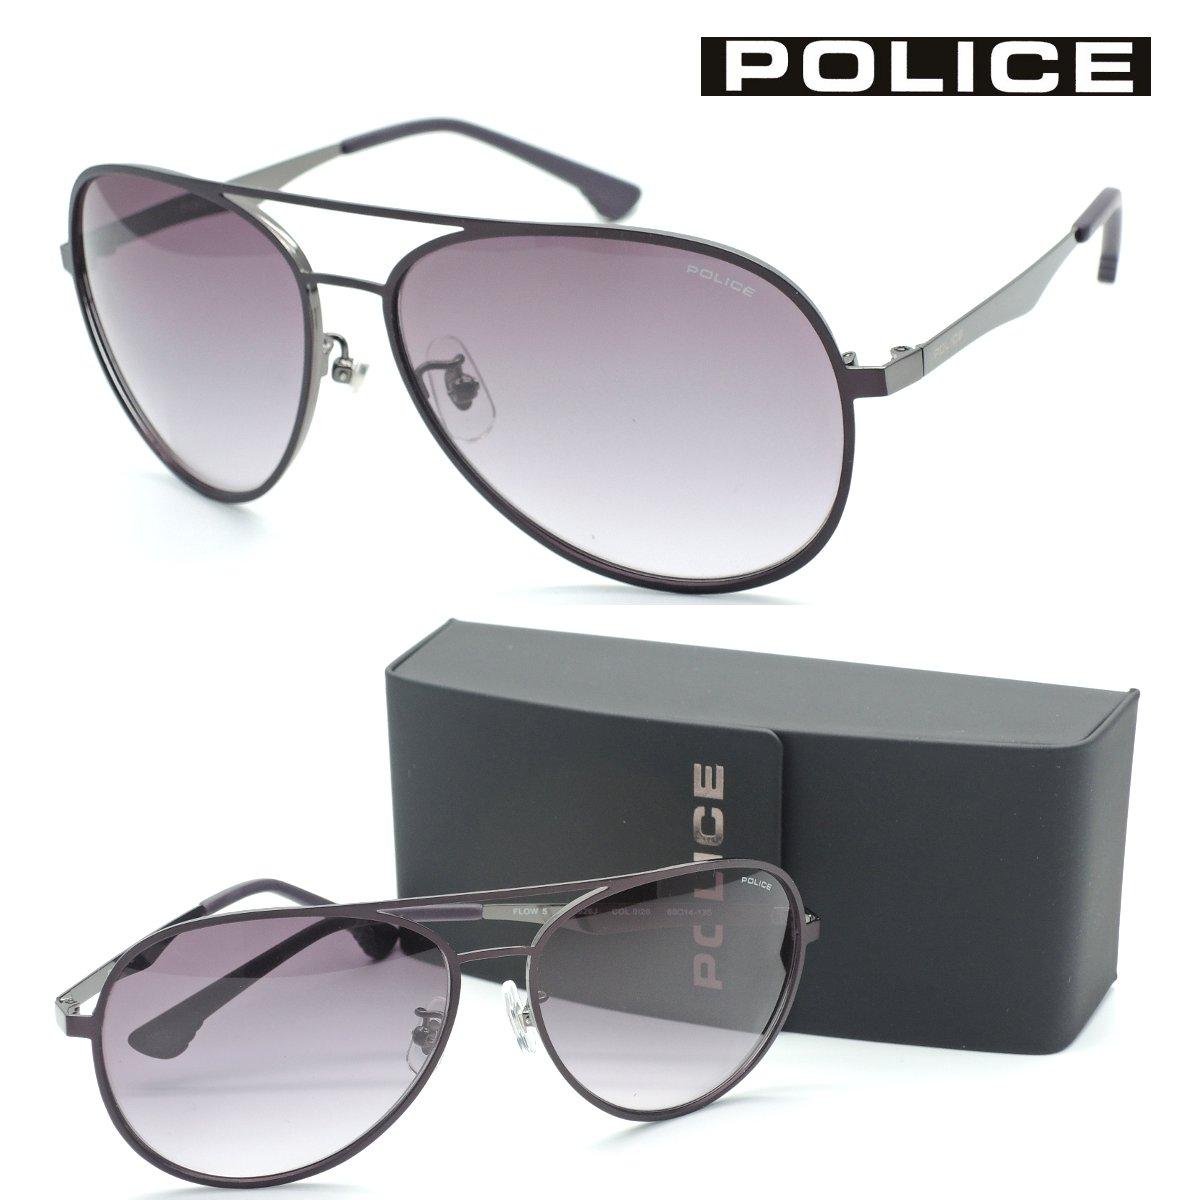 【POLICE】ポリス サングラス SPL526J col.0I20【国内正規品】【店内全品送料無料】メンズ ユニセックス